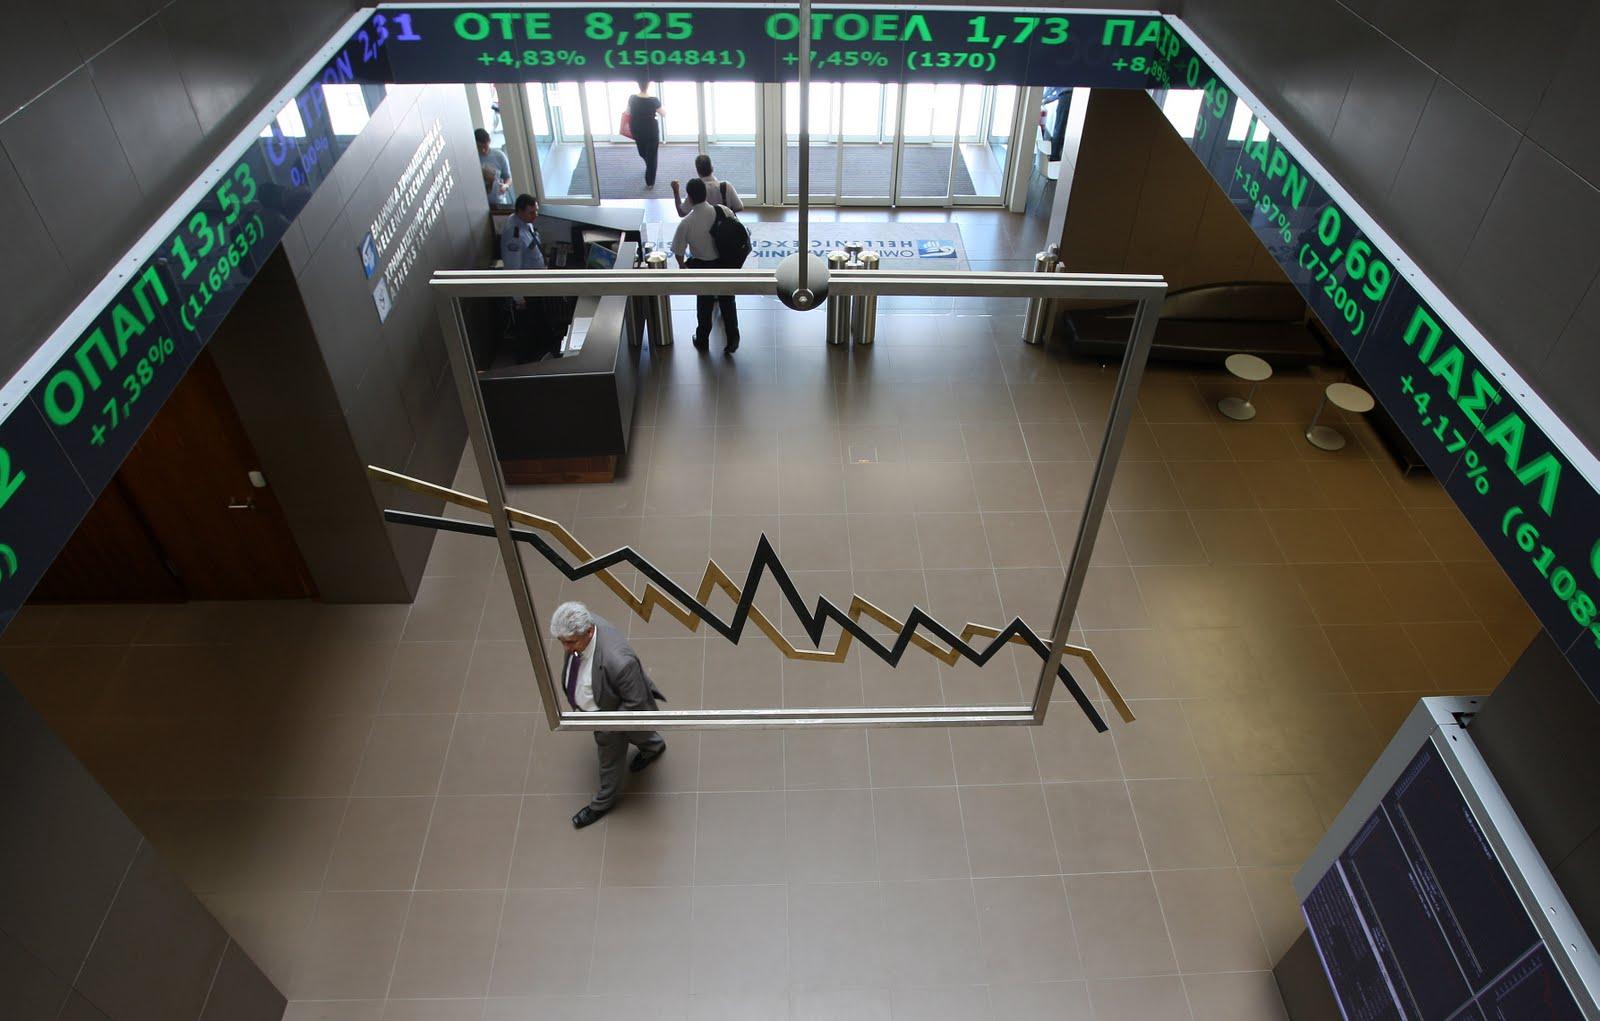 To XA παραμένει στις ανεπτυγμένες αγορές